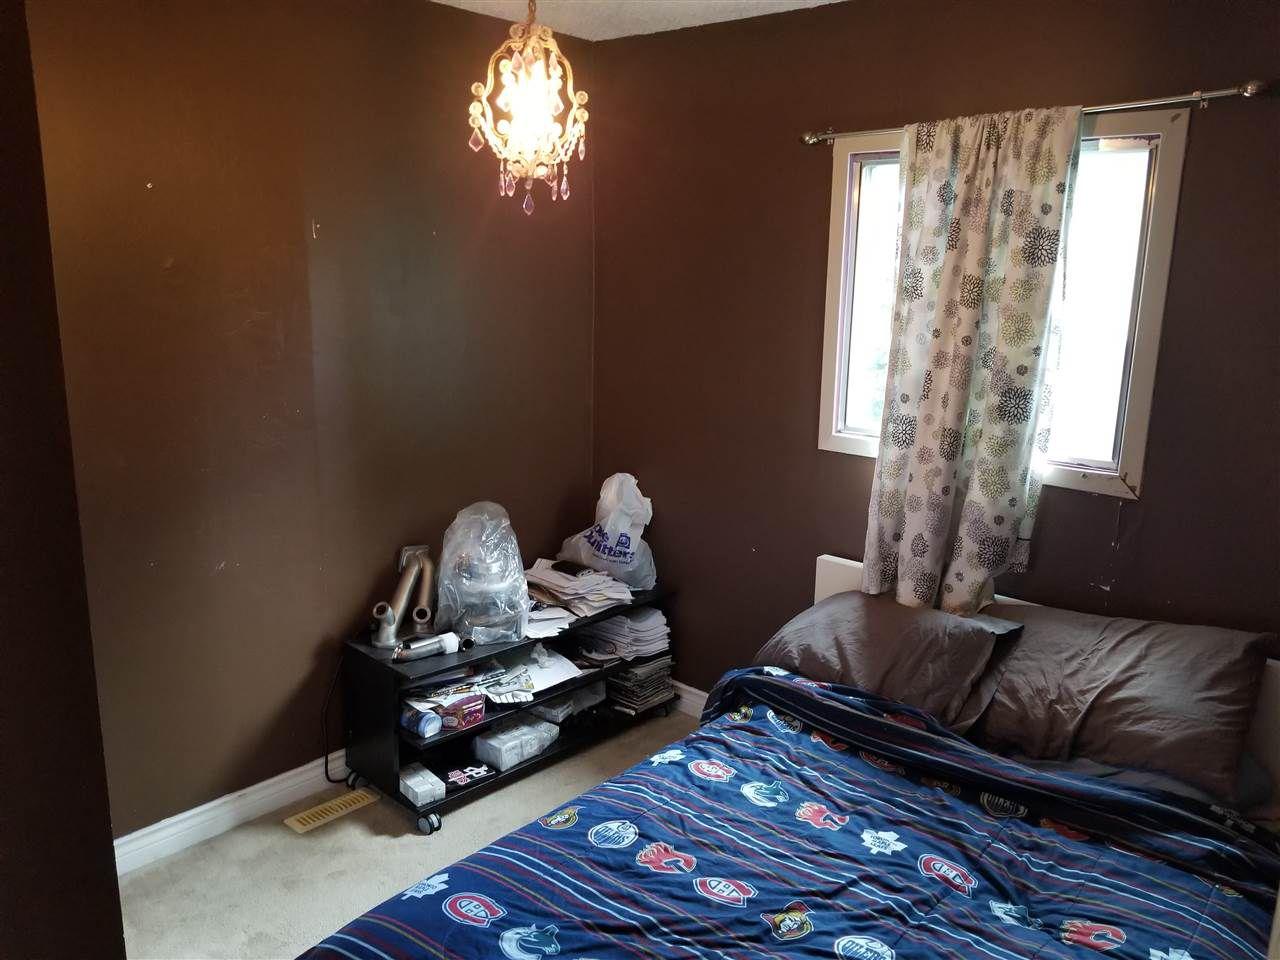 Photo 8: Photos: 9242 152 Street in Edmonton: Zone 22 House for sale : MLS®# E4158939